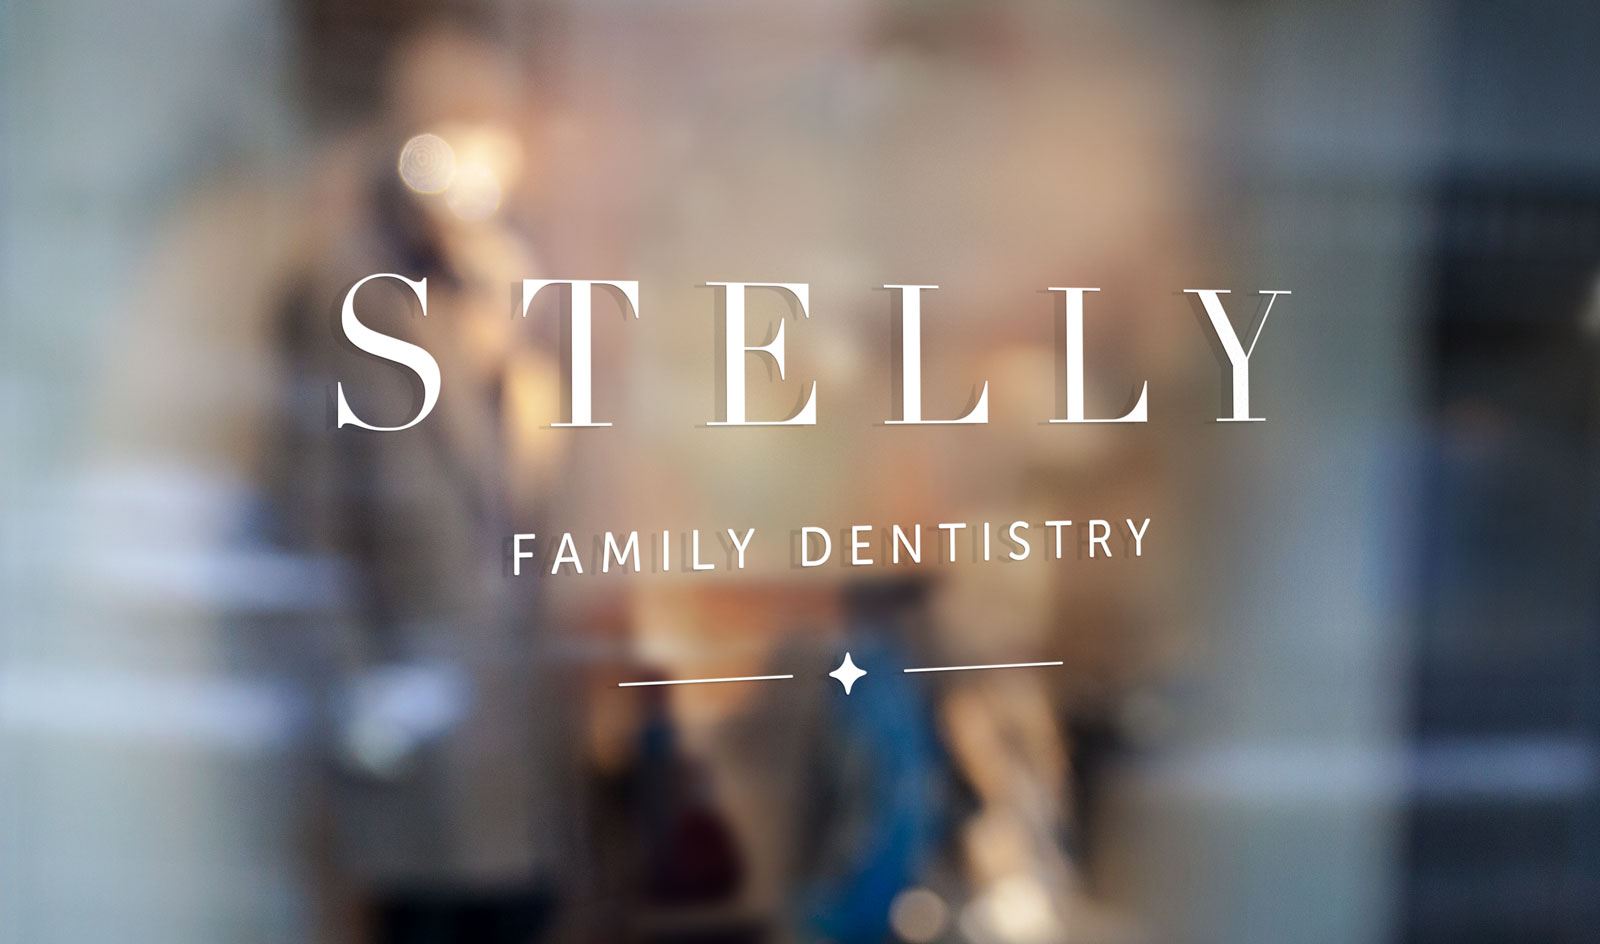 Stelly-Family-Dentistry-Window-Sign.jpg